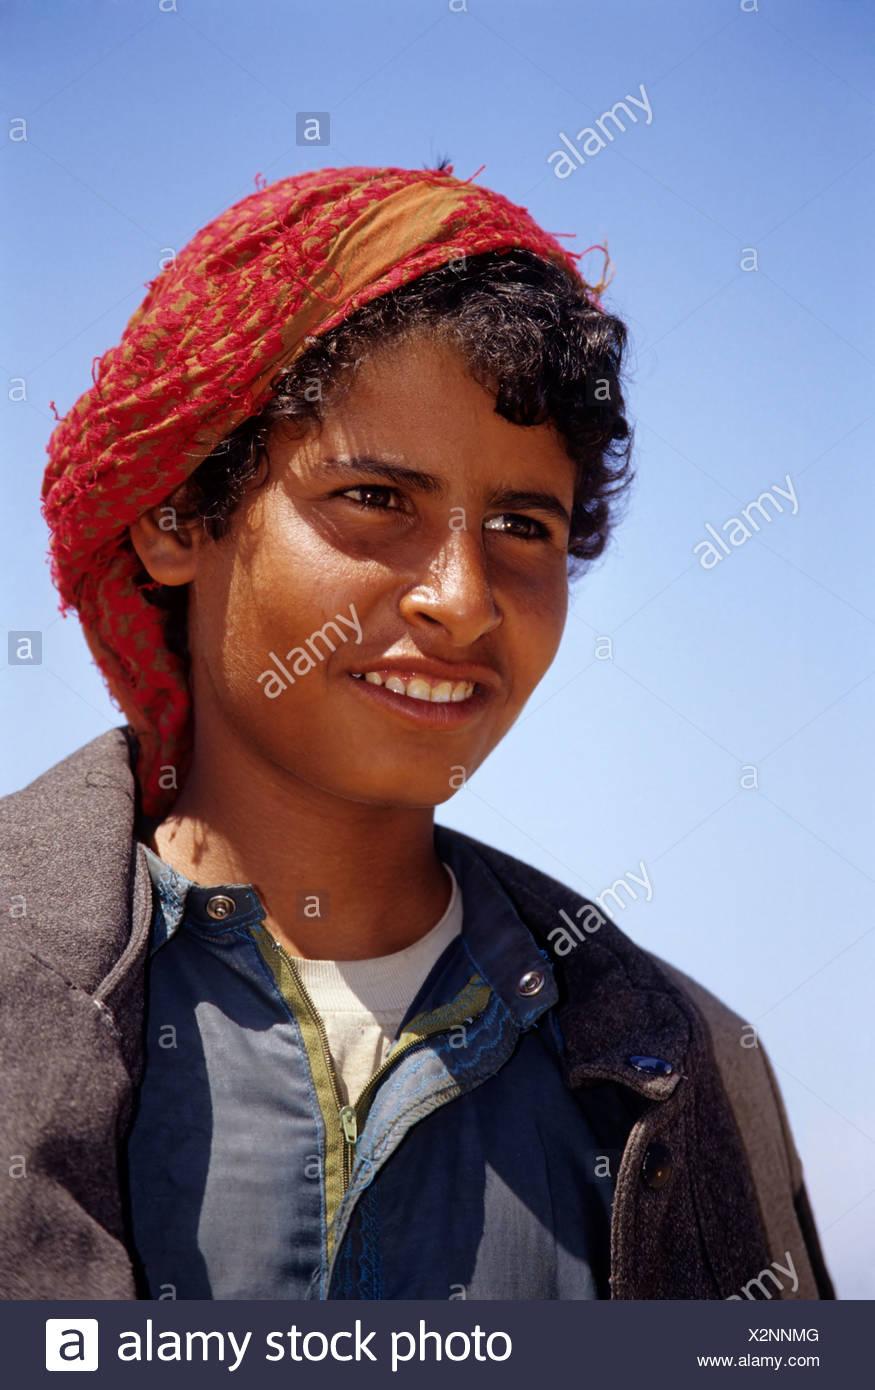 Camel shepherd, Egyptian in traditional dress, garment, portrait, Dschjellahba, Jelleba, clothes, Arabian, Egyptian, Dschellaba - Stock Image